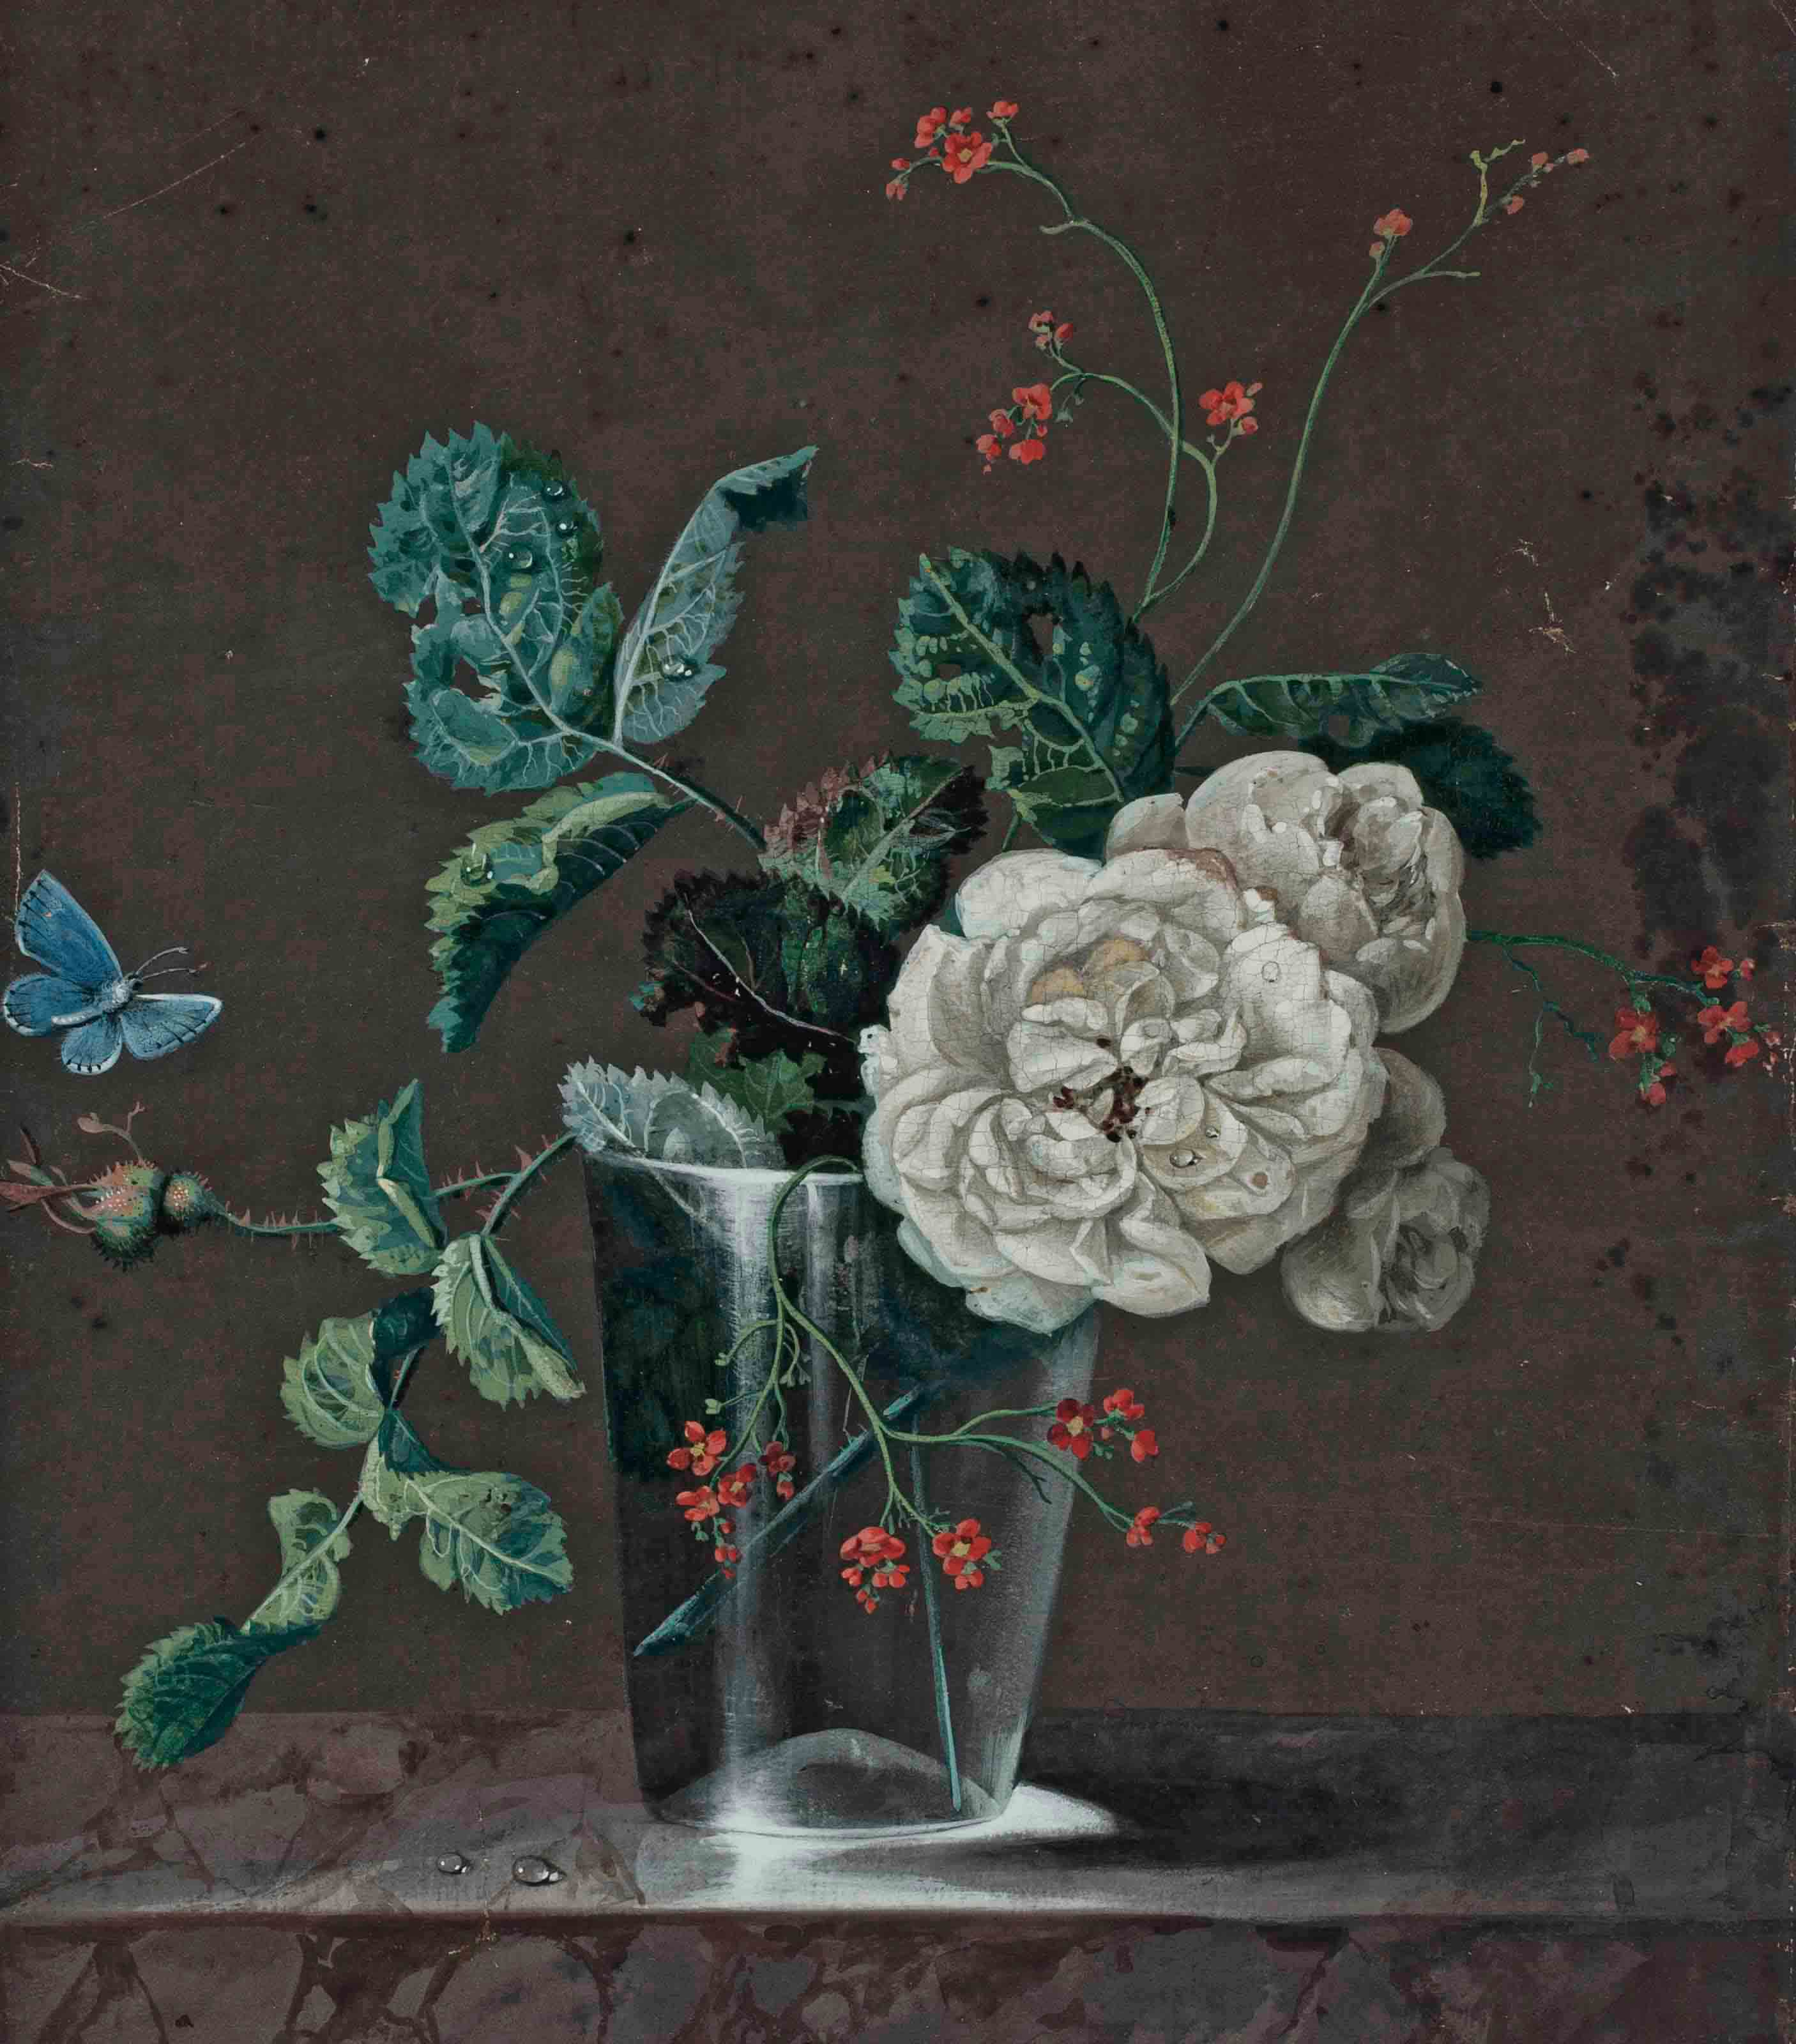 MADELEINE FRANCOISE BASSEPORTE (PARIS 1701-1780)